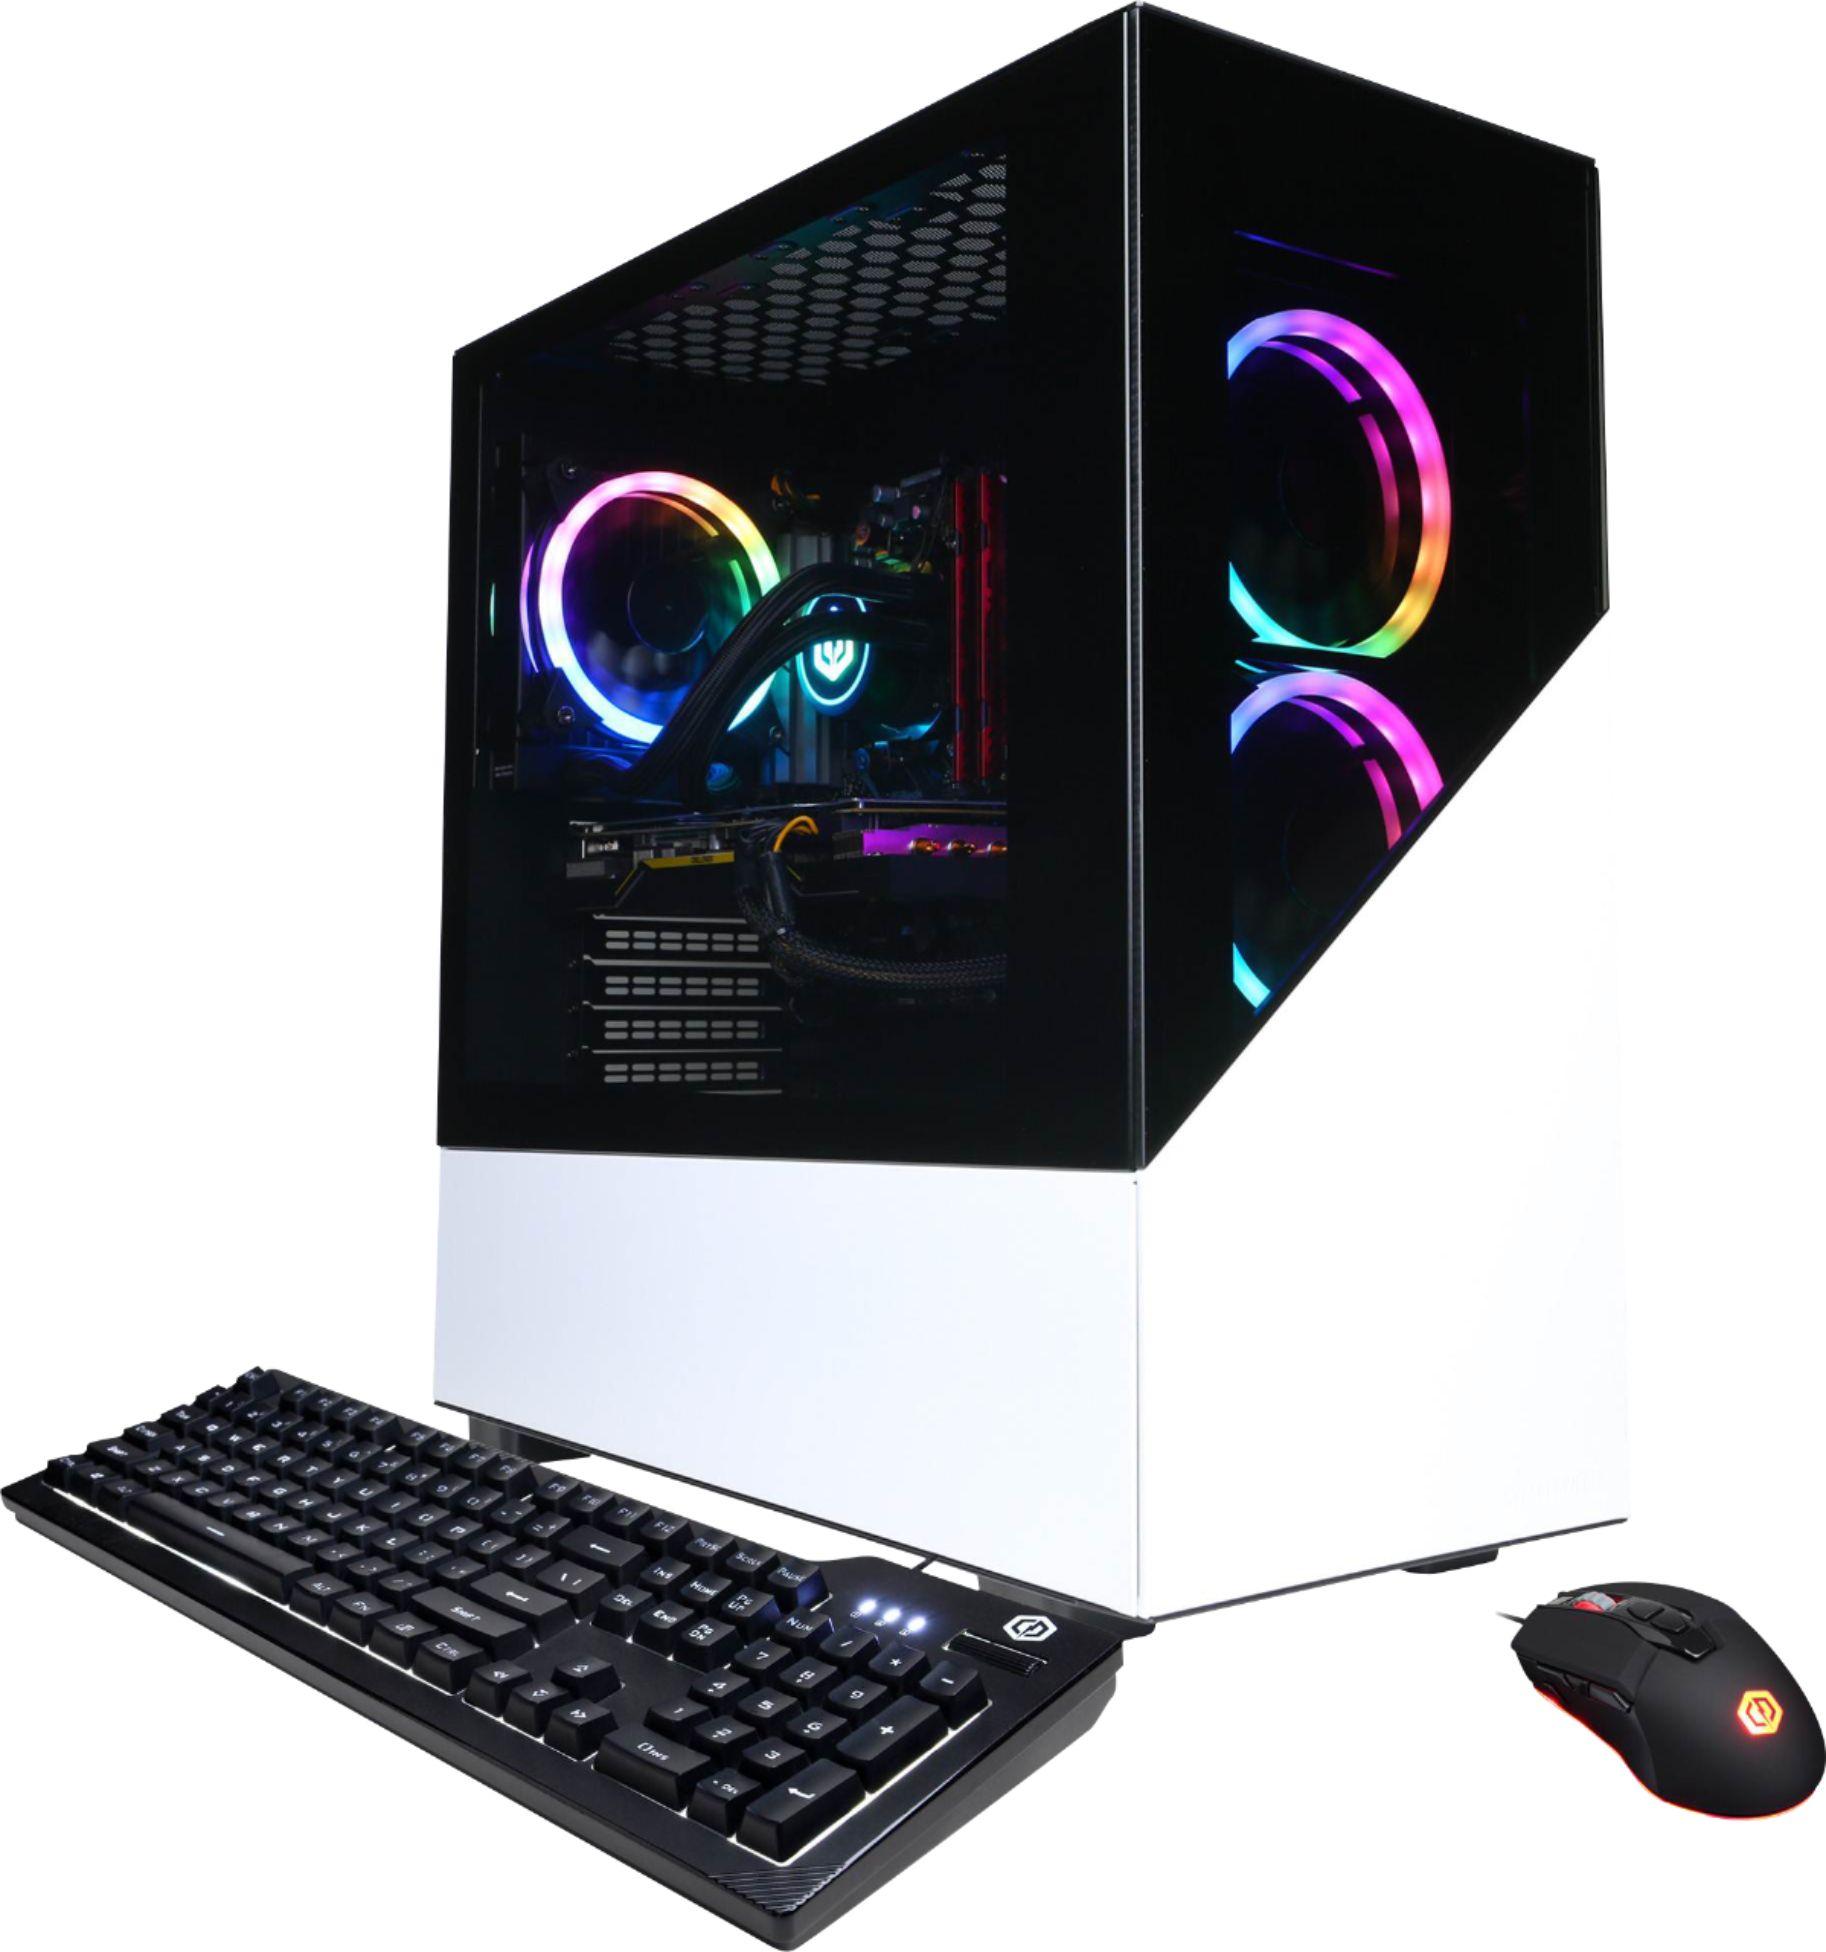 CyberPowerPC Gamer Supreme Gaming Desktop AMD Ryzen 7 3700X 16GB Memory NVIDIA GeForce RTX 3070 1TB SSD White SLC8600BST - $1599